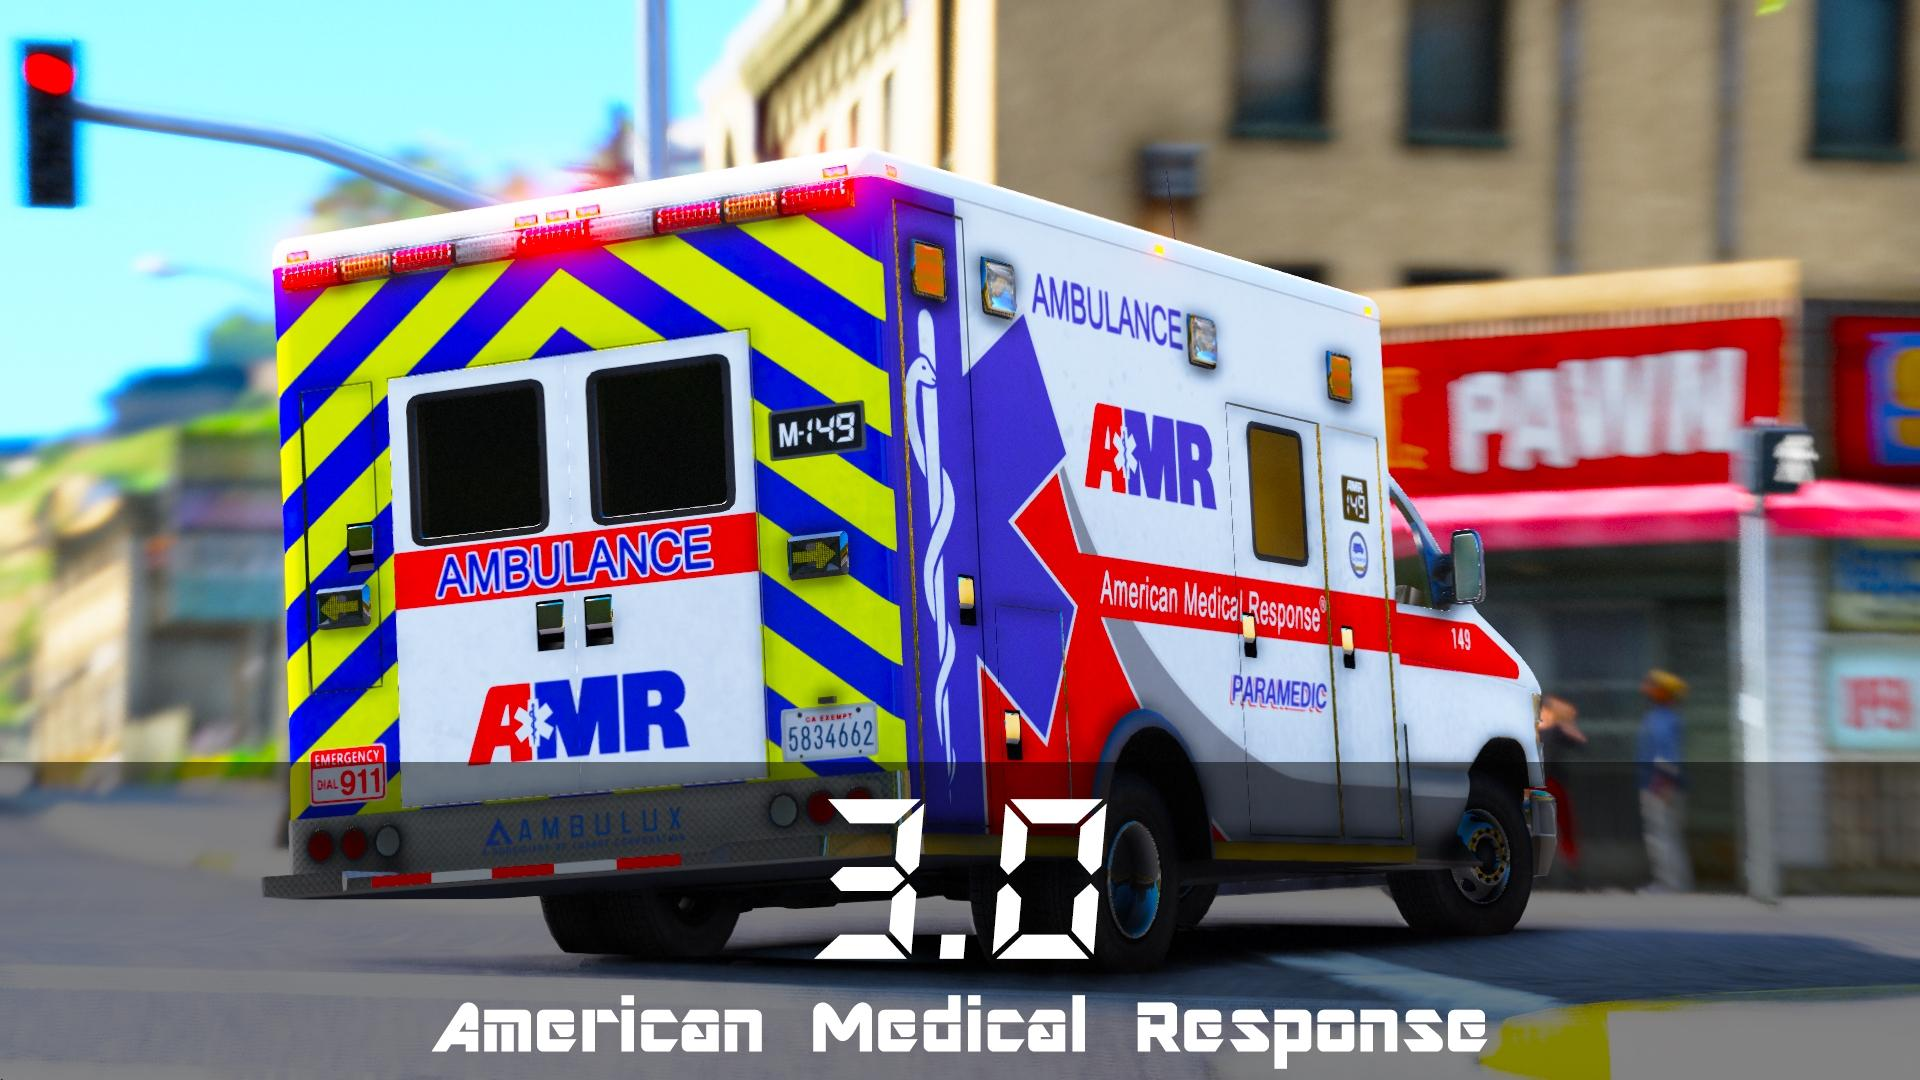 American Medical Response Amr Ambulance Skin Pack Gta5